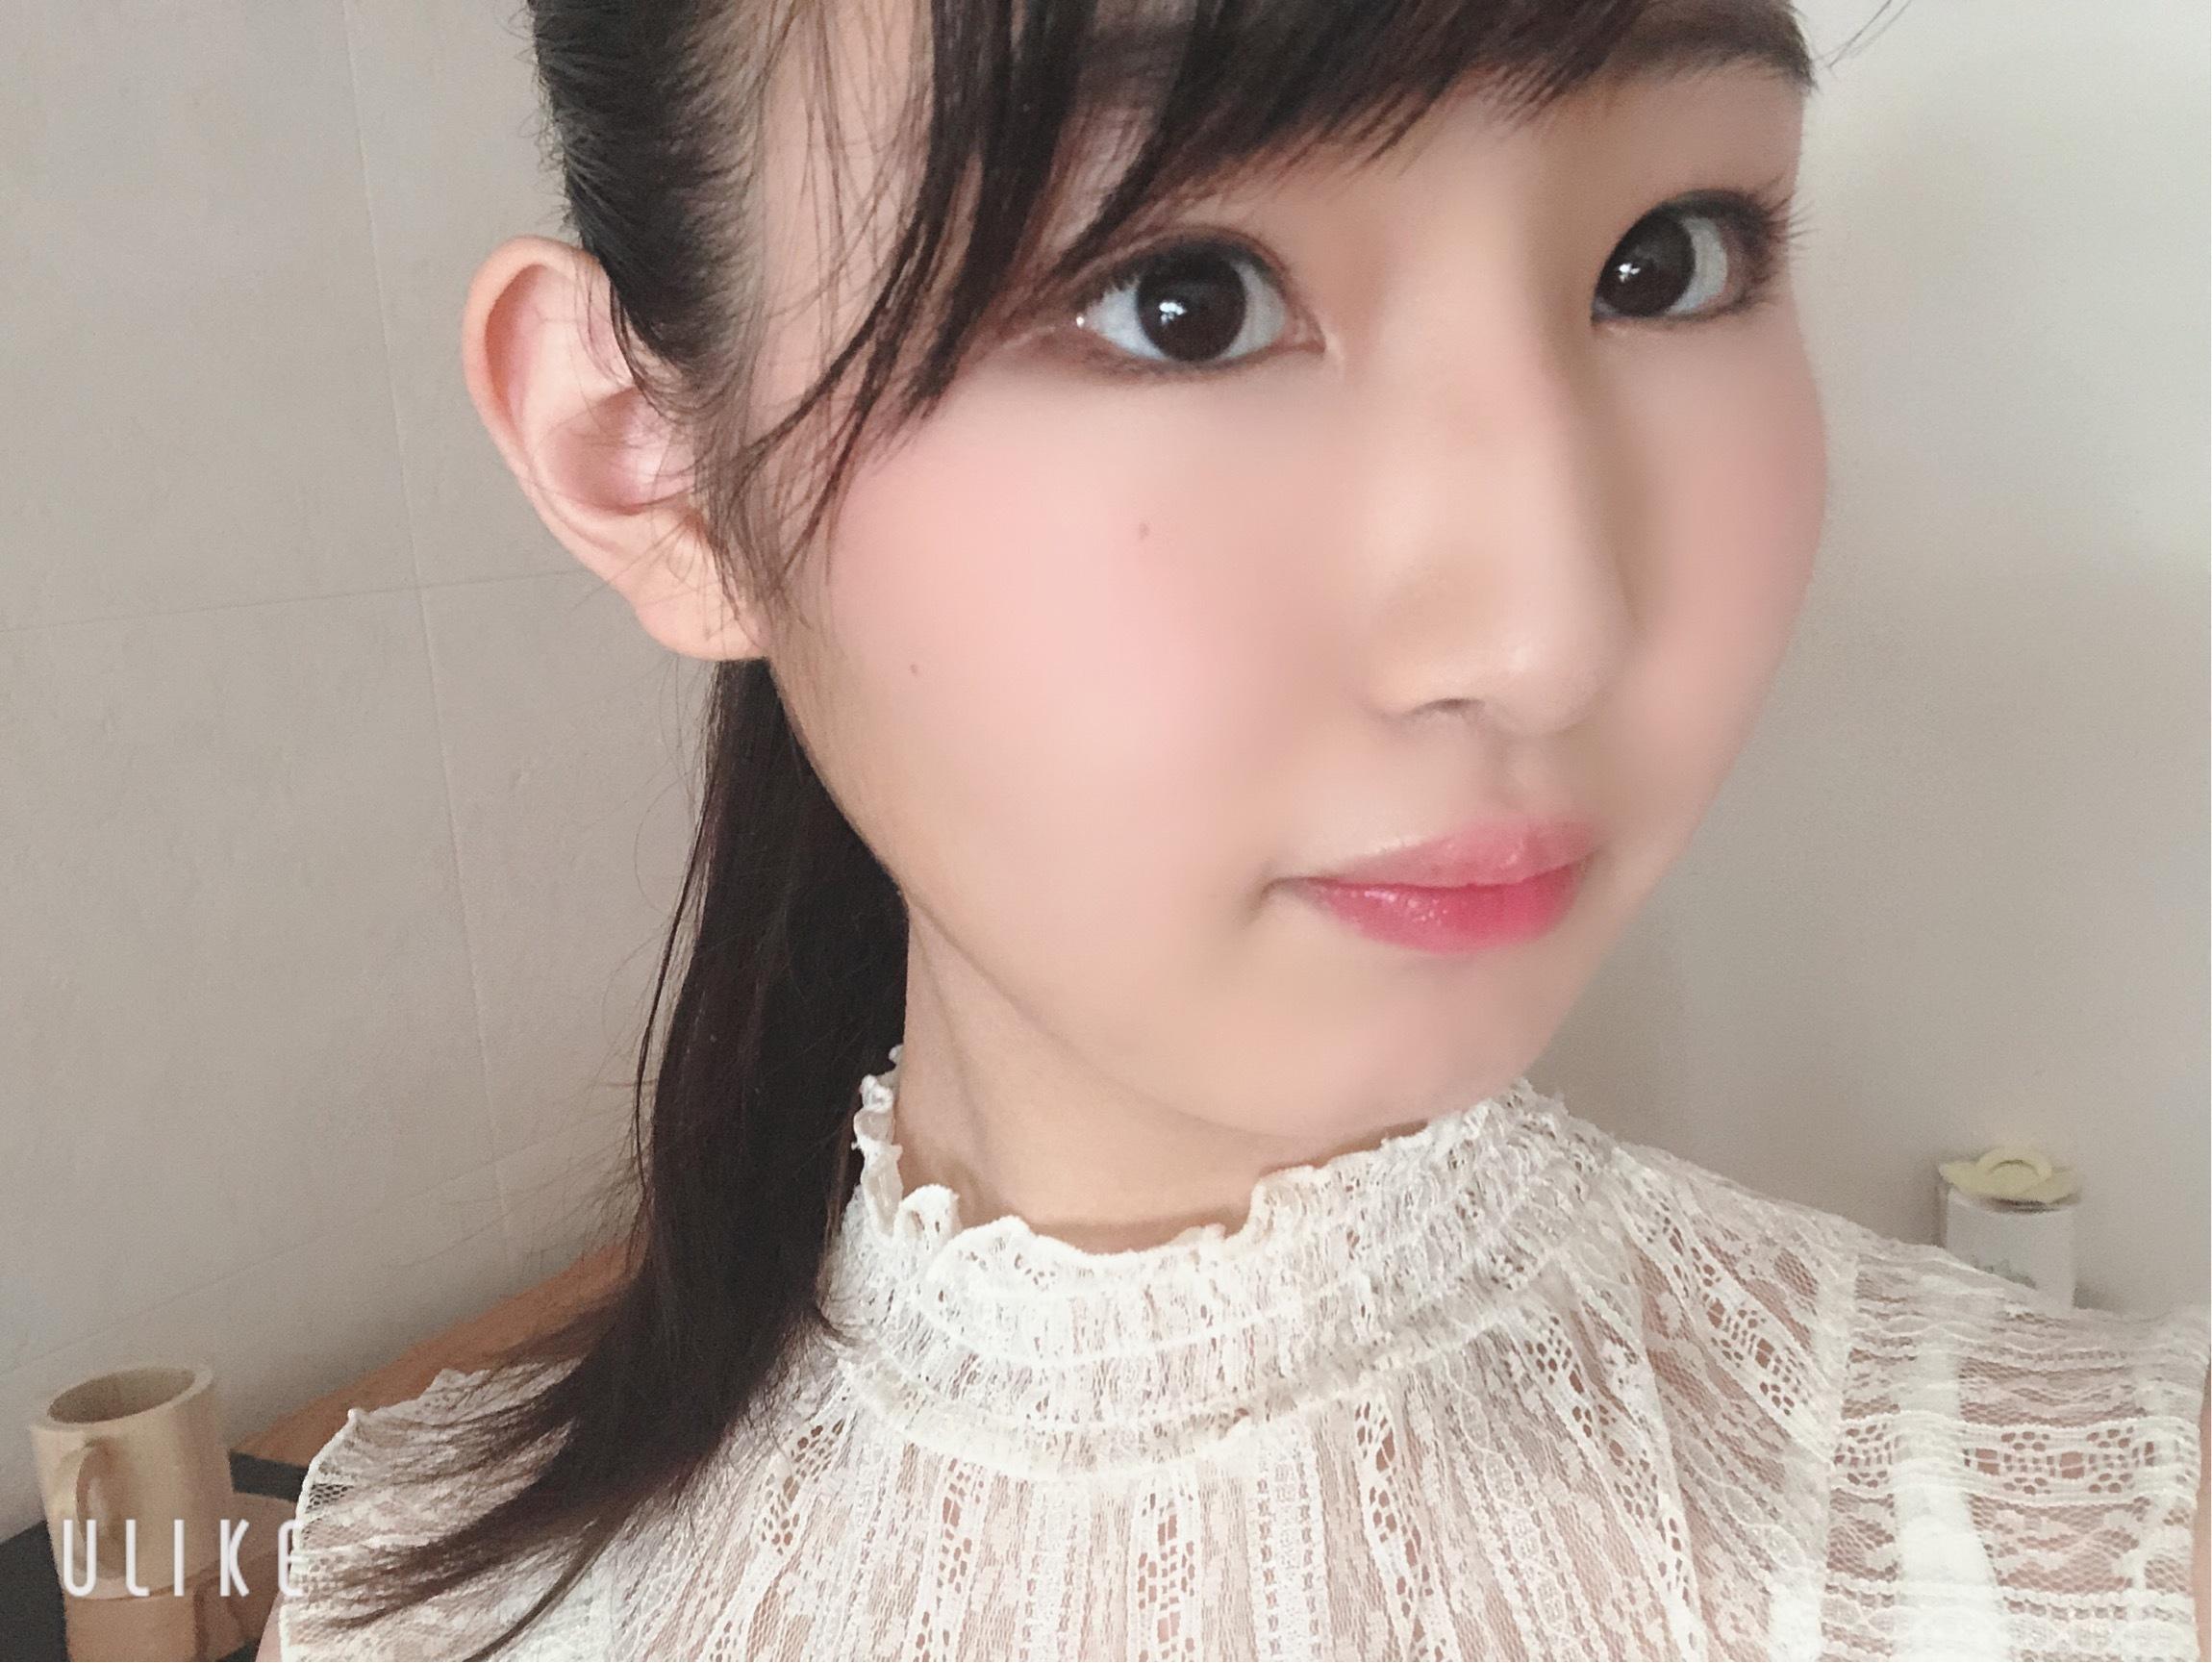 JILLの新作コスメが可愛すぎる♡①ぶどうリップ?!_1_2-1